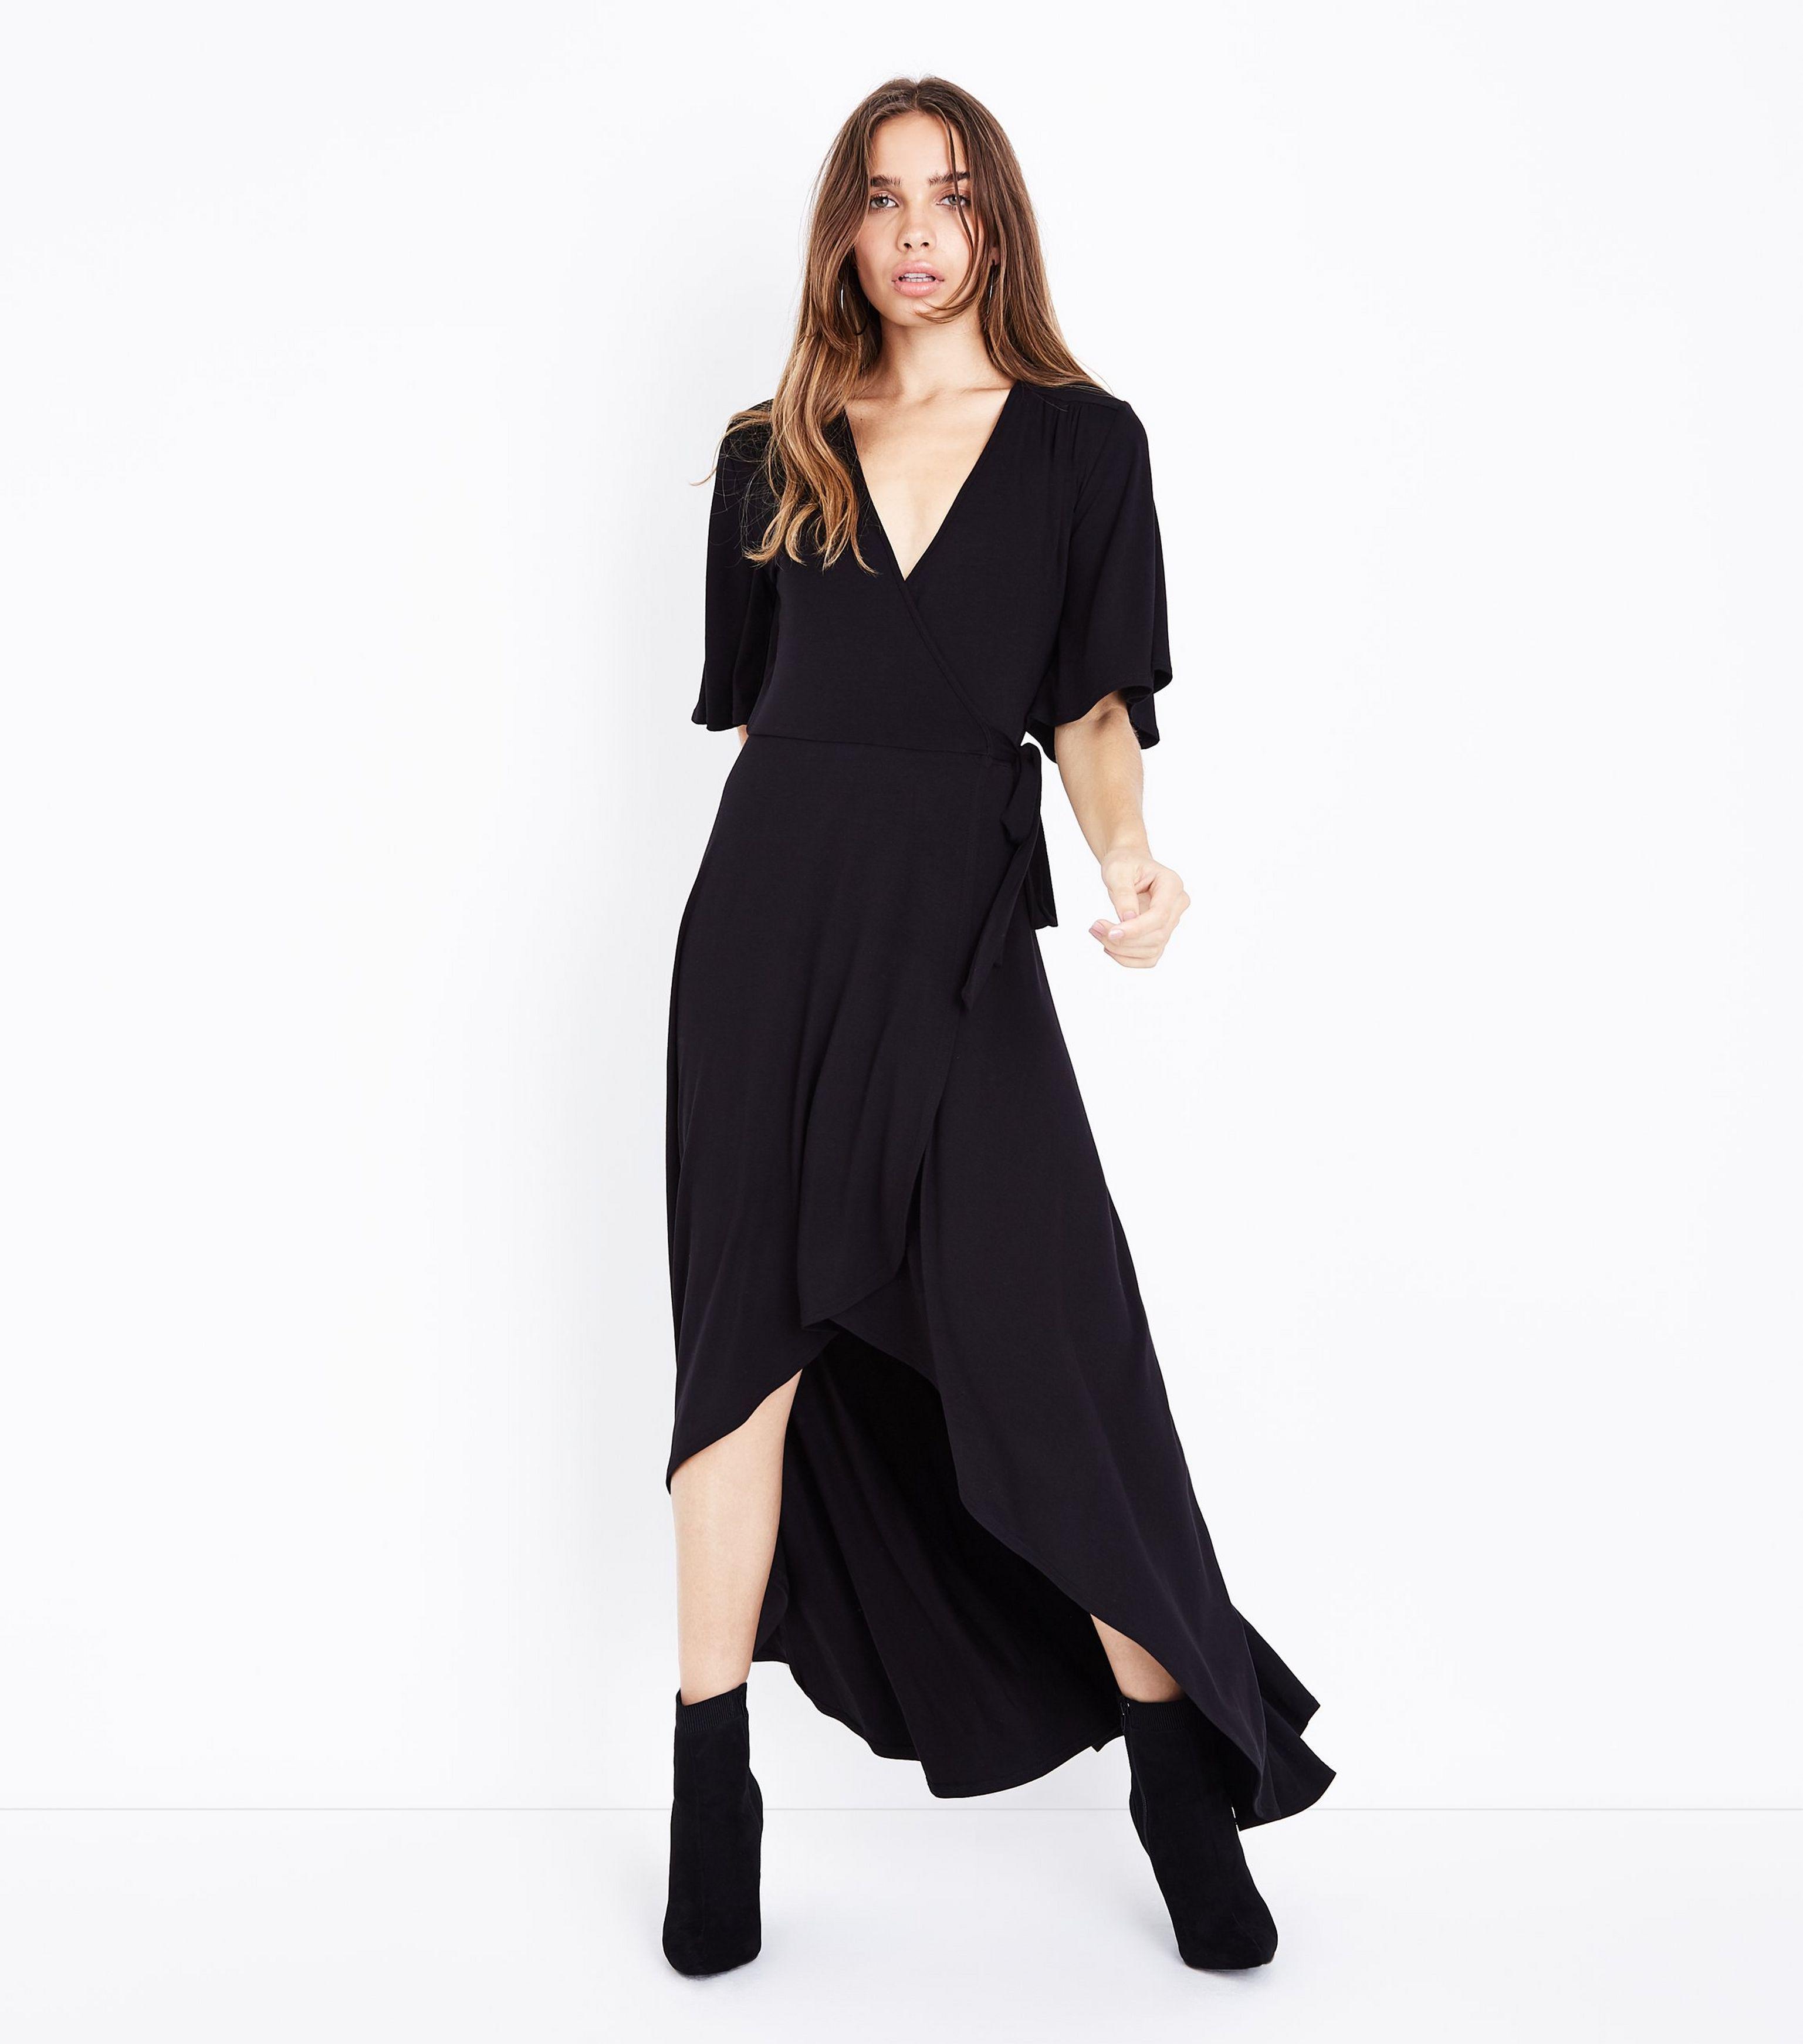 e6ecf83c936 New Look Black Wrap Front Dip Hem Jersey Maxi Dress in Black - Lyst